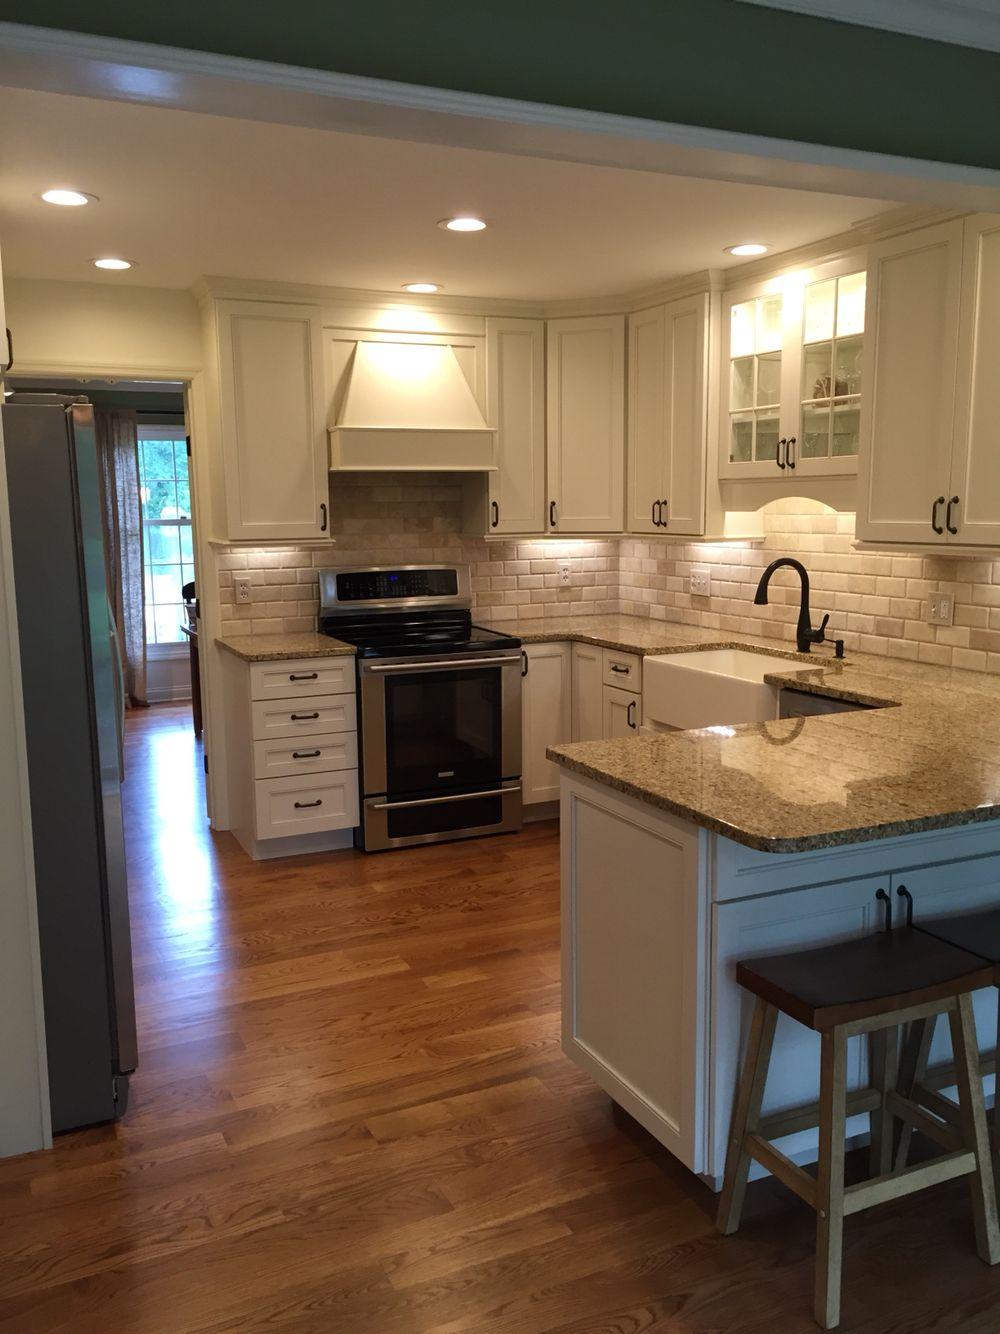 Prosource Wholesale Cincinnati White Diamond Cabinets With Site Finished White Oak Hardwood Flo White Oak Hardwood Floors Kitchen Remodel Oak Hardwood Flooring